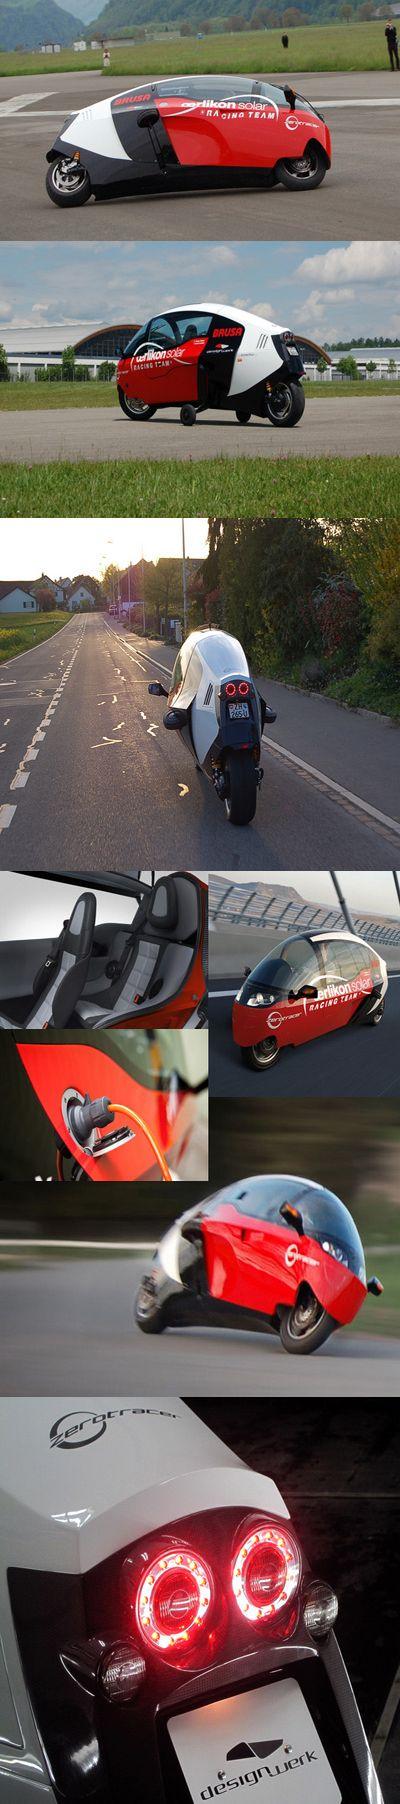 Мотоцикл-кокон безвыхлопа обогнёт мир наперегонки